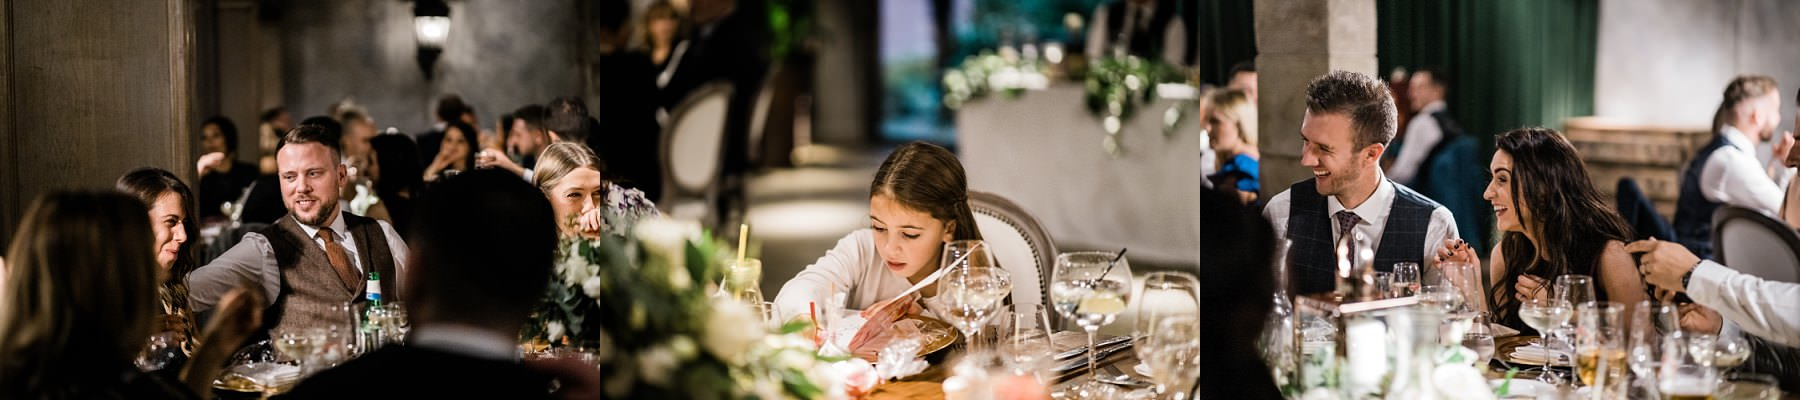 Evening reception Le petite Chateau wedding - Newcastle Wedding Photographer